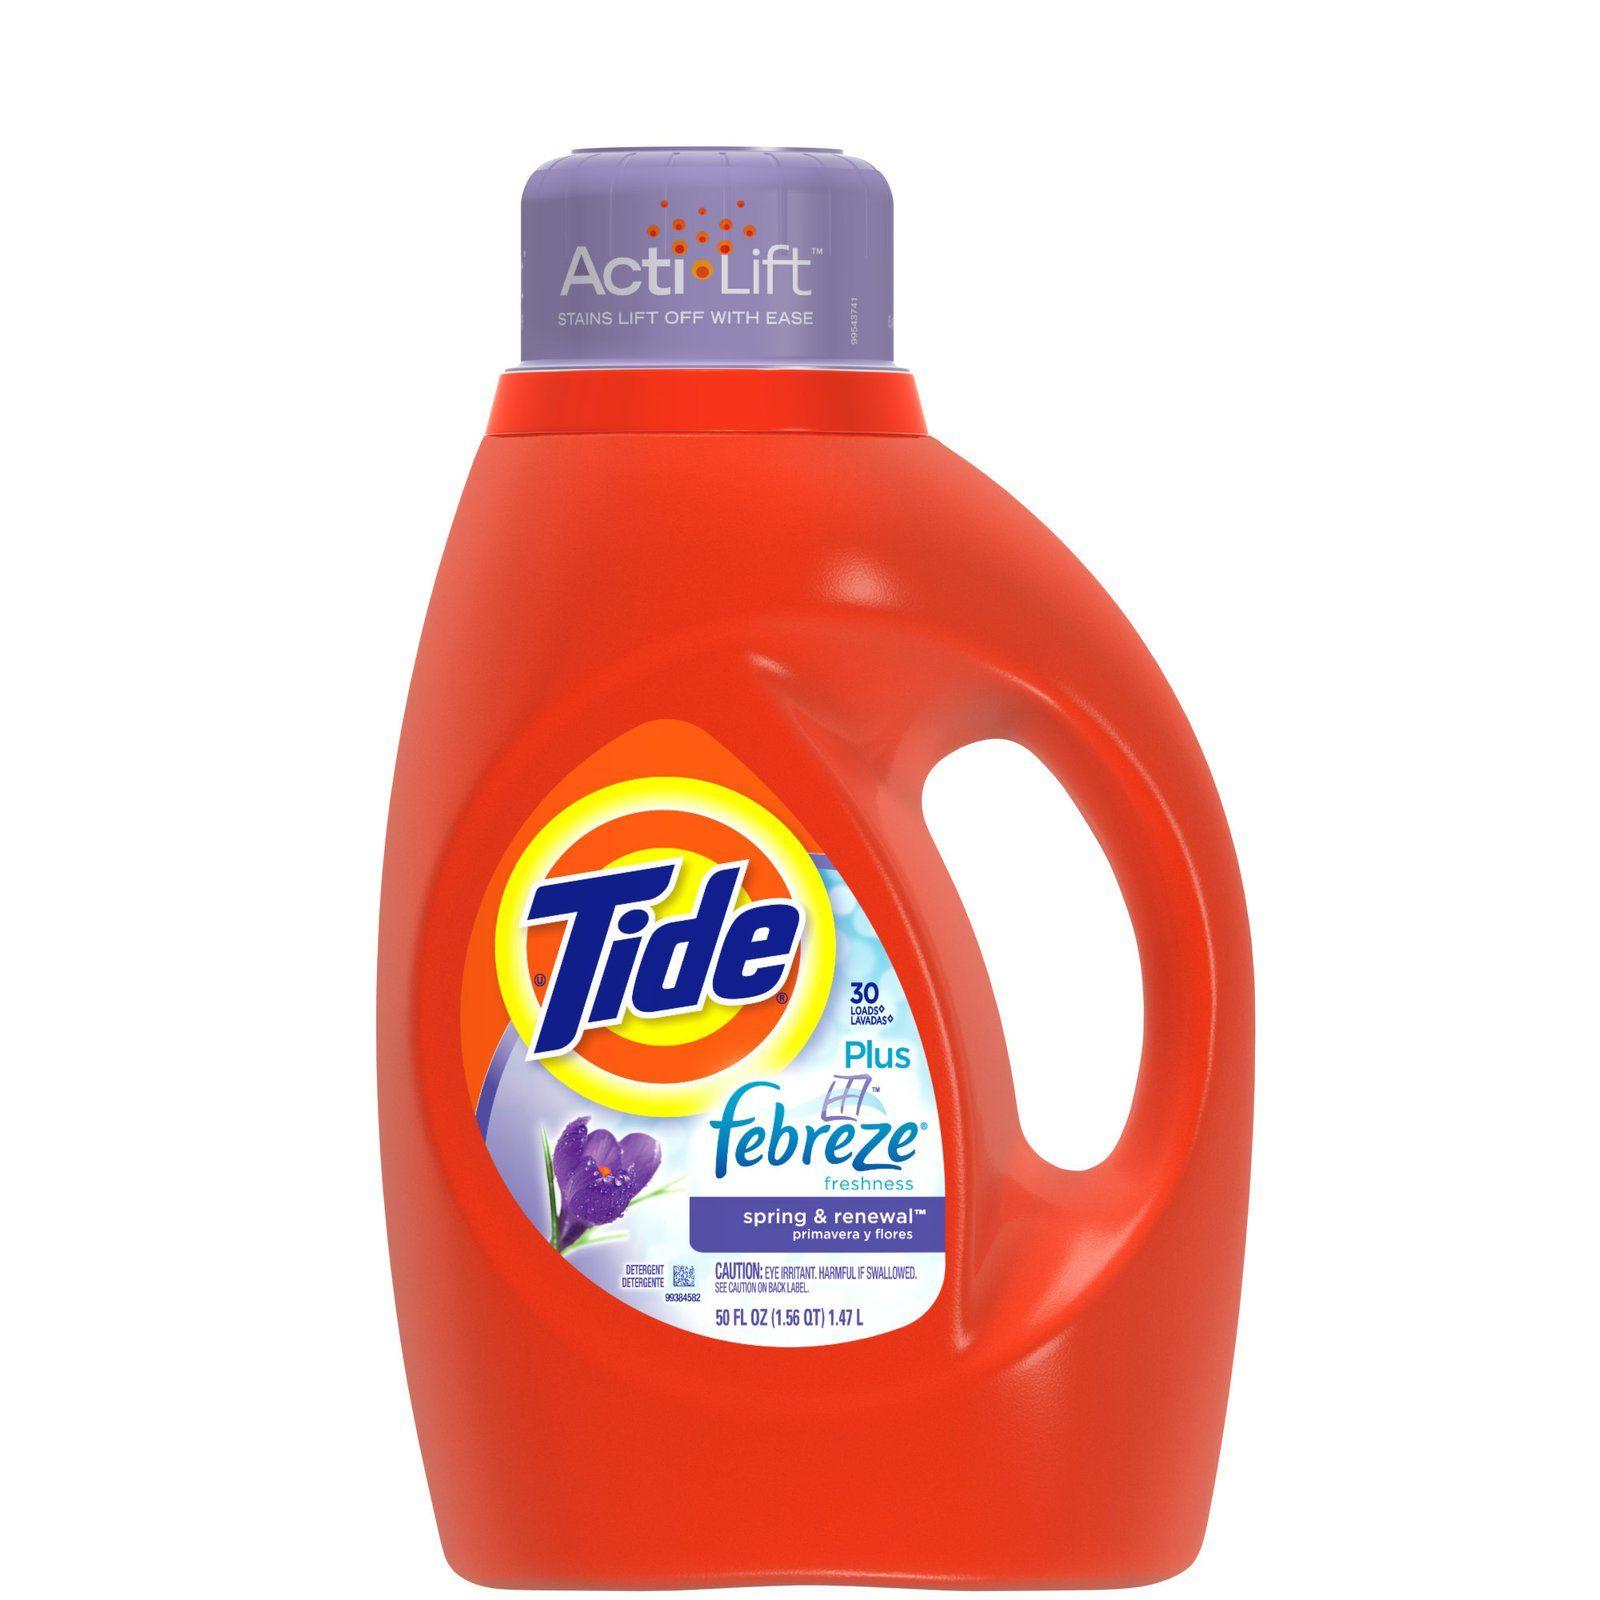 Tide With Febreze Freshness Liquid Detergentwith Actilift Spring Renewal Tide Liquid Detergent Liquid Laundry Detergent Laundry Detergent